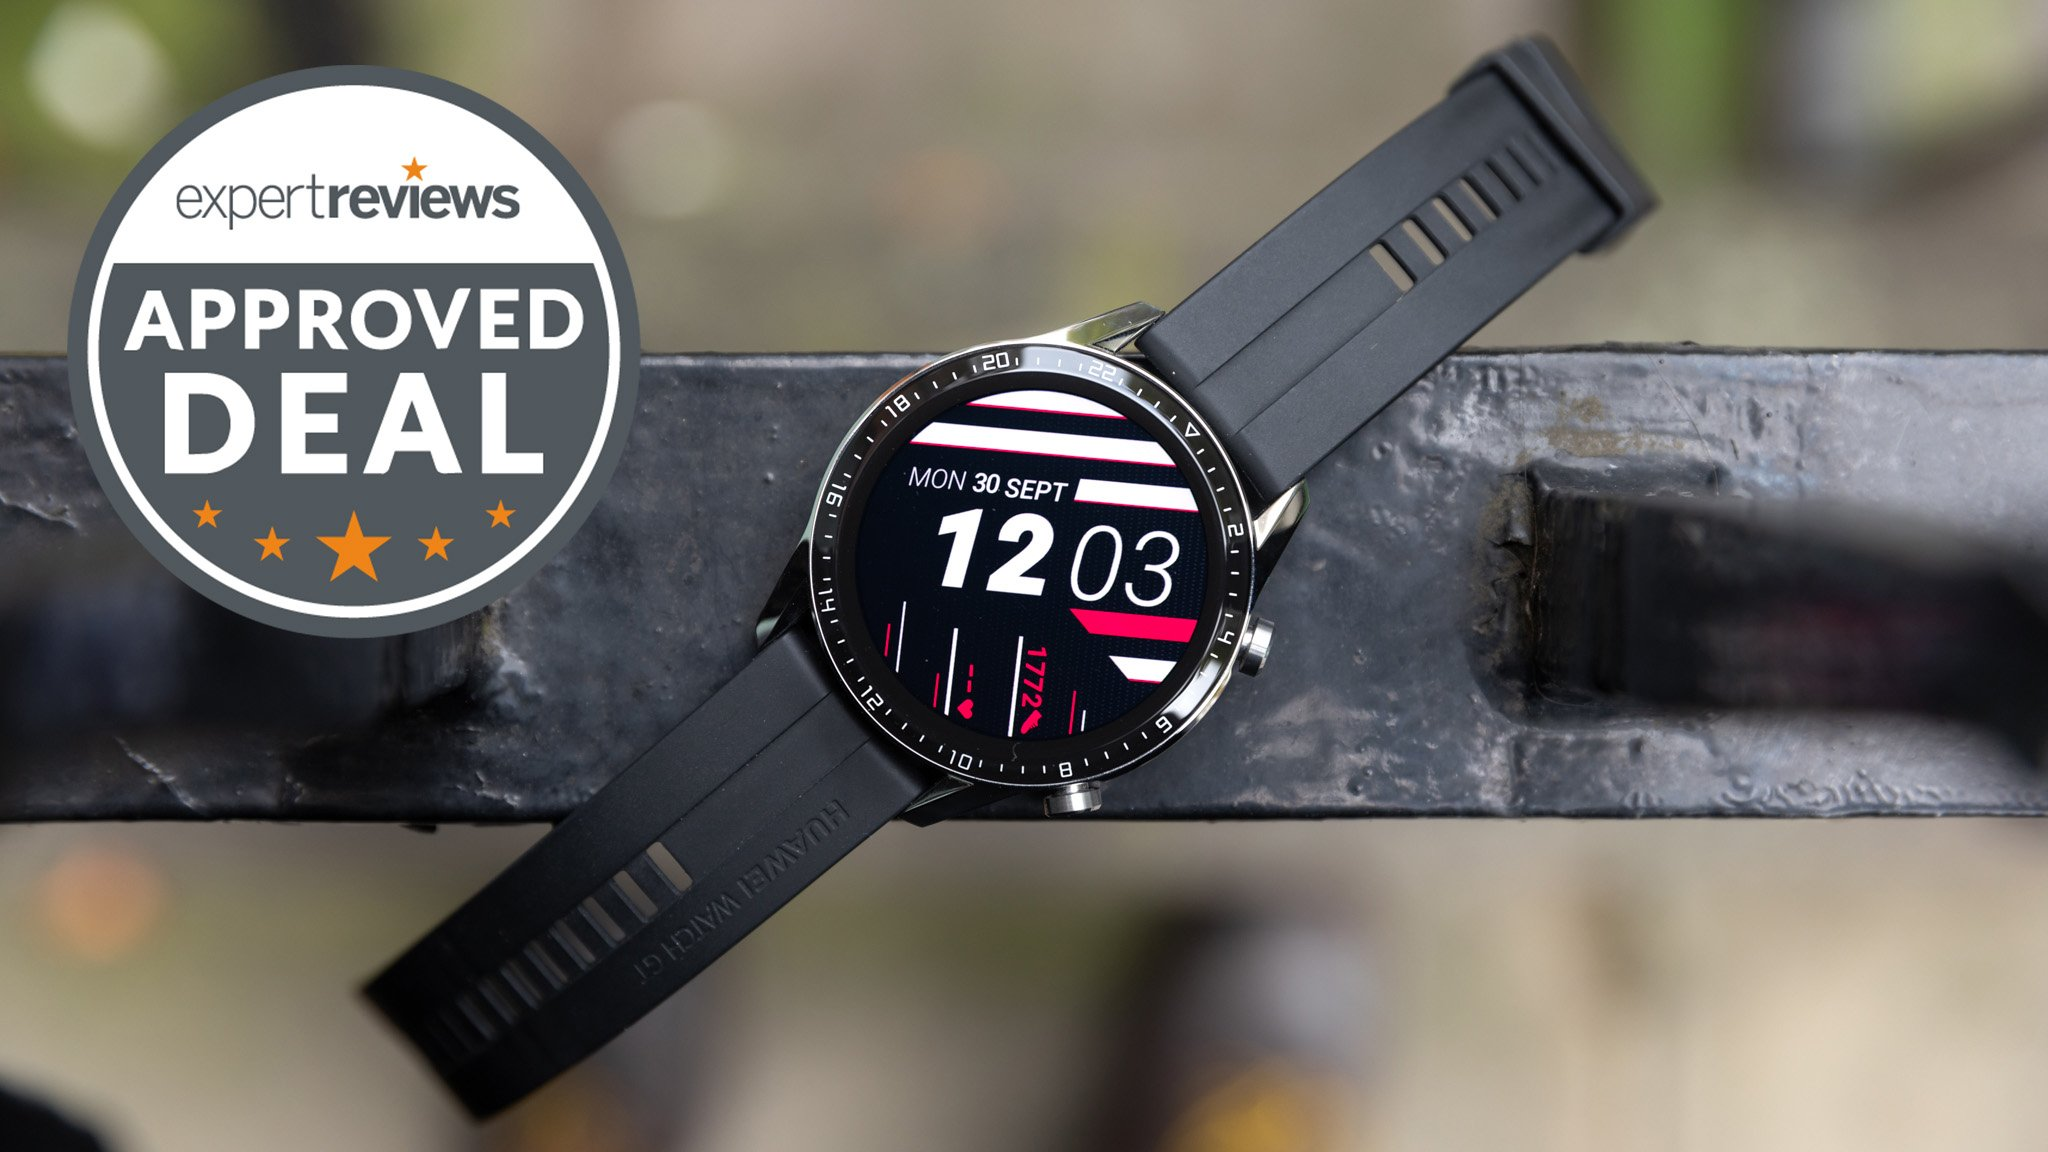 Huawei Watch Gt 2 Black Friday